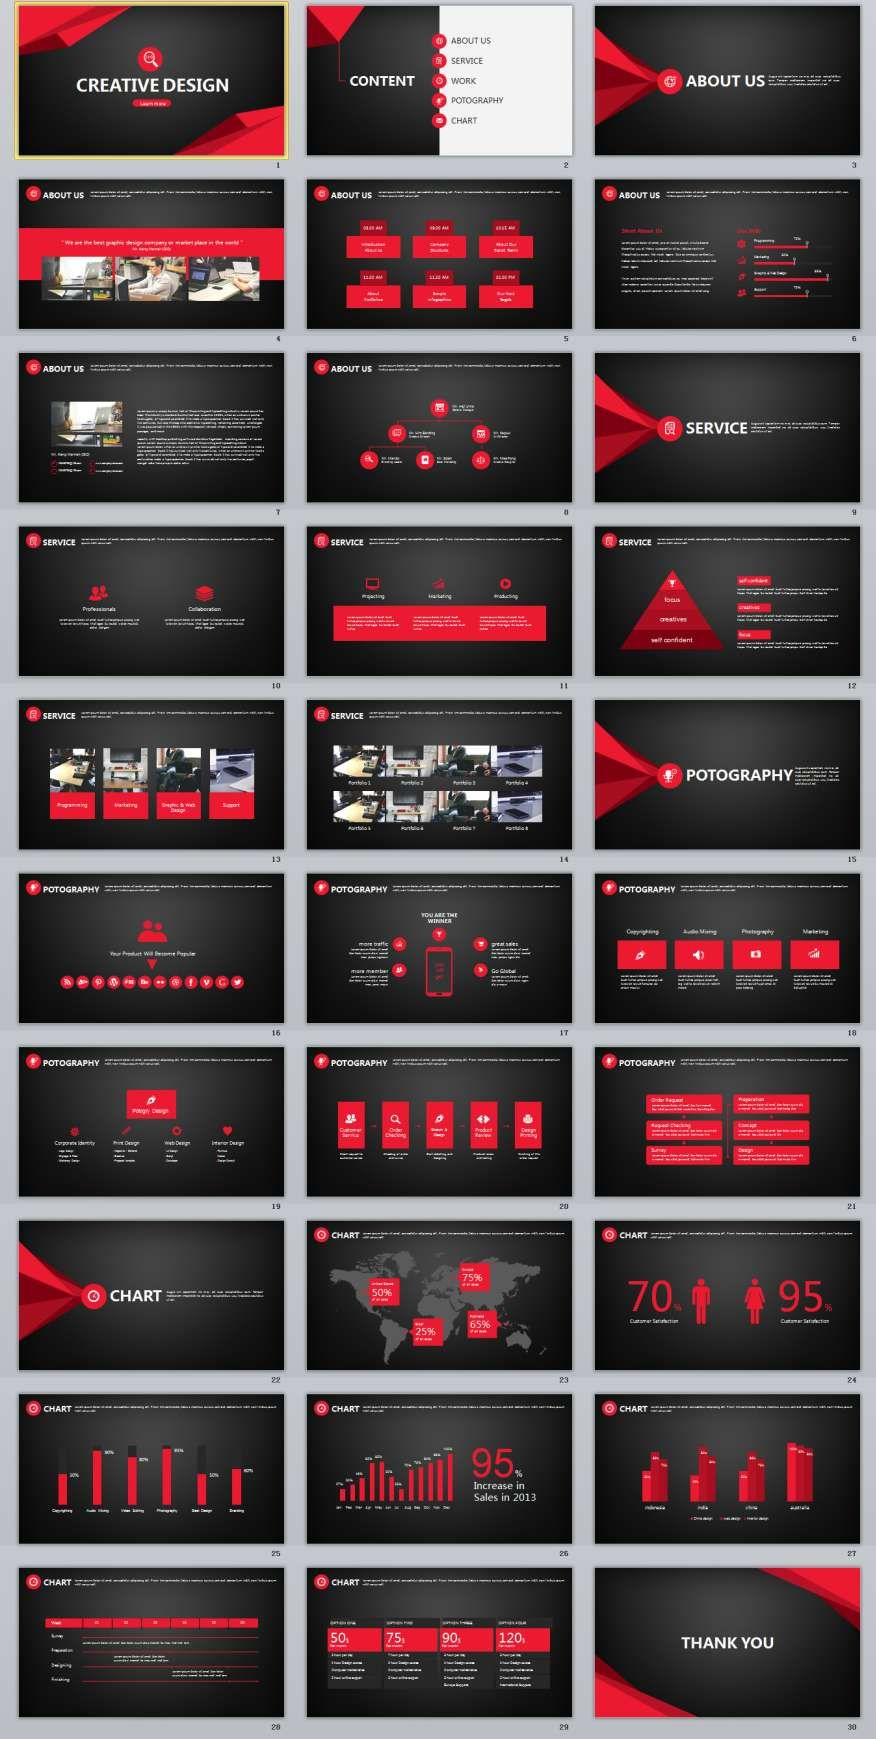 30 black creative design powerpoint template the highest 30 black creative design powerpoint template the highest quality powerpoint templates and keynote templates alramifo Choice Image